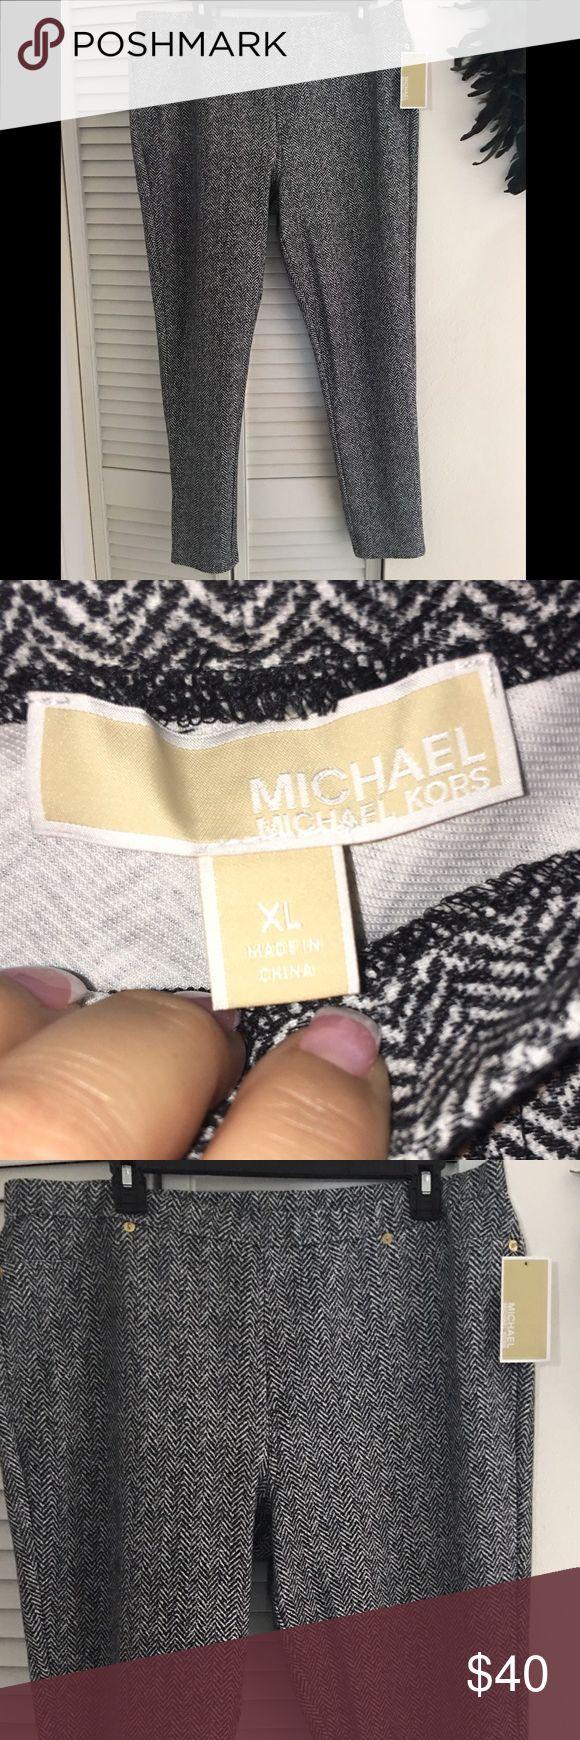 Michael Kors herringbone chevron pants pull on XL Nwt. Size XL. Michael Kors. Pull on. Ships fast. Smokefree. MICHAEL Michael Kors Pants Skinny